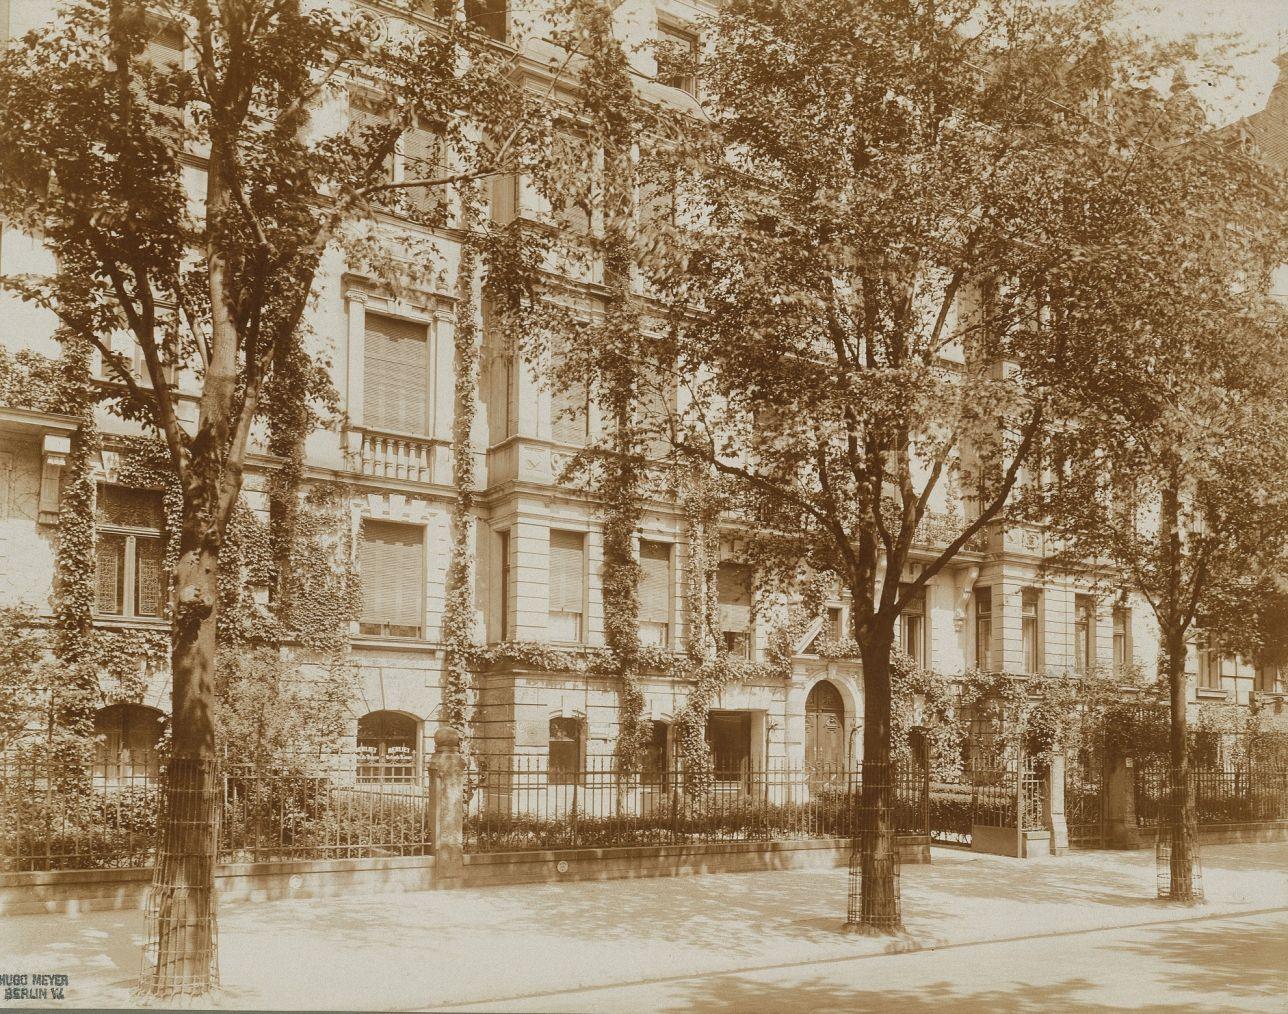 1891 berlin charlottenburg mietsh user kurf rstendamm 23 25 heute budapester stra e foto. Black Bedroom Furniture Sets. Home Design Ideas